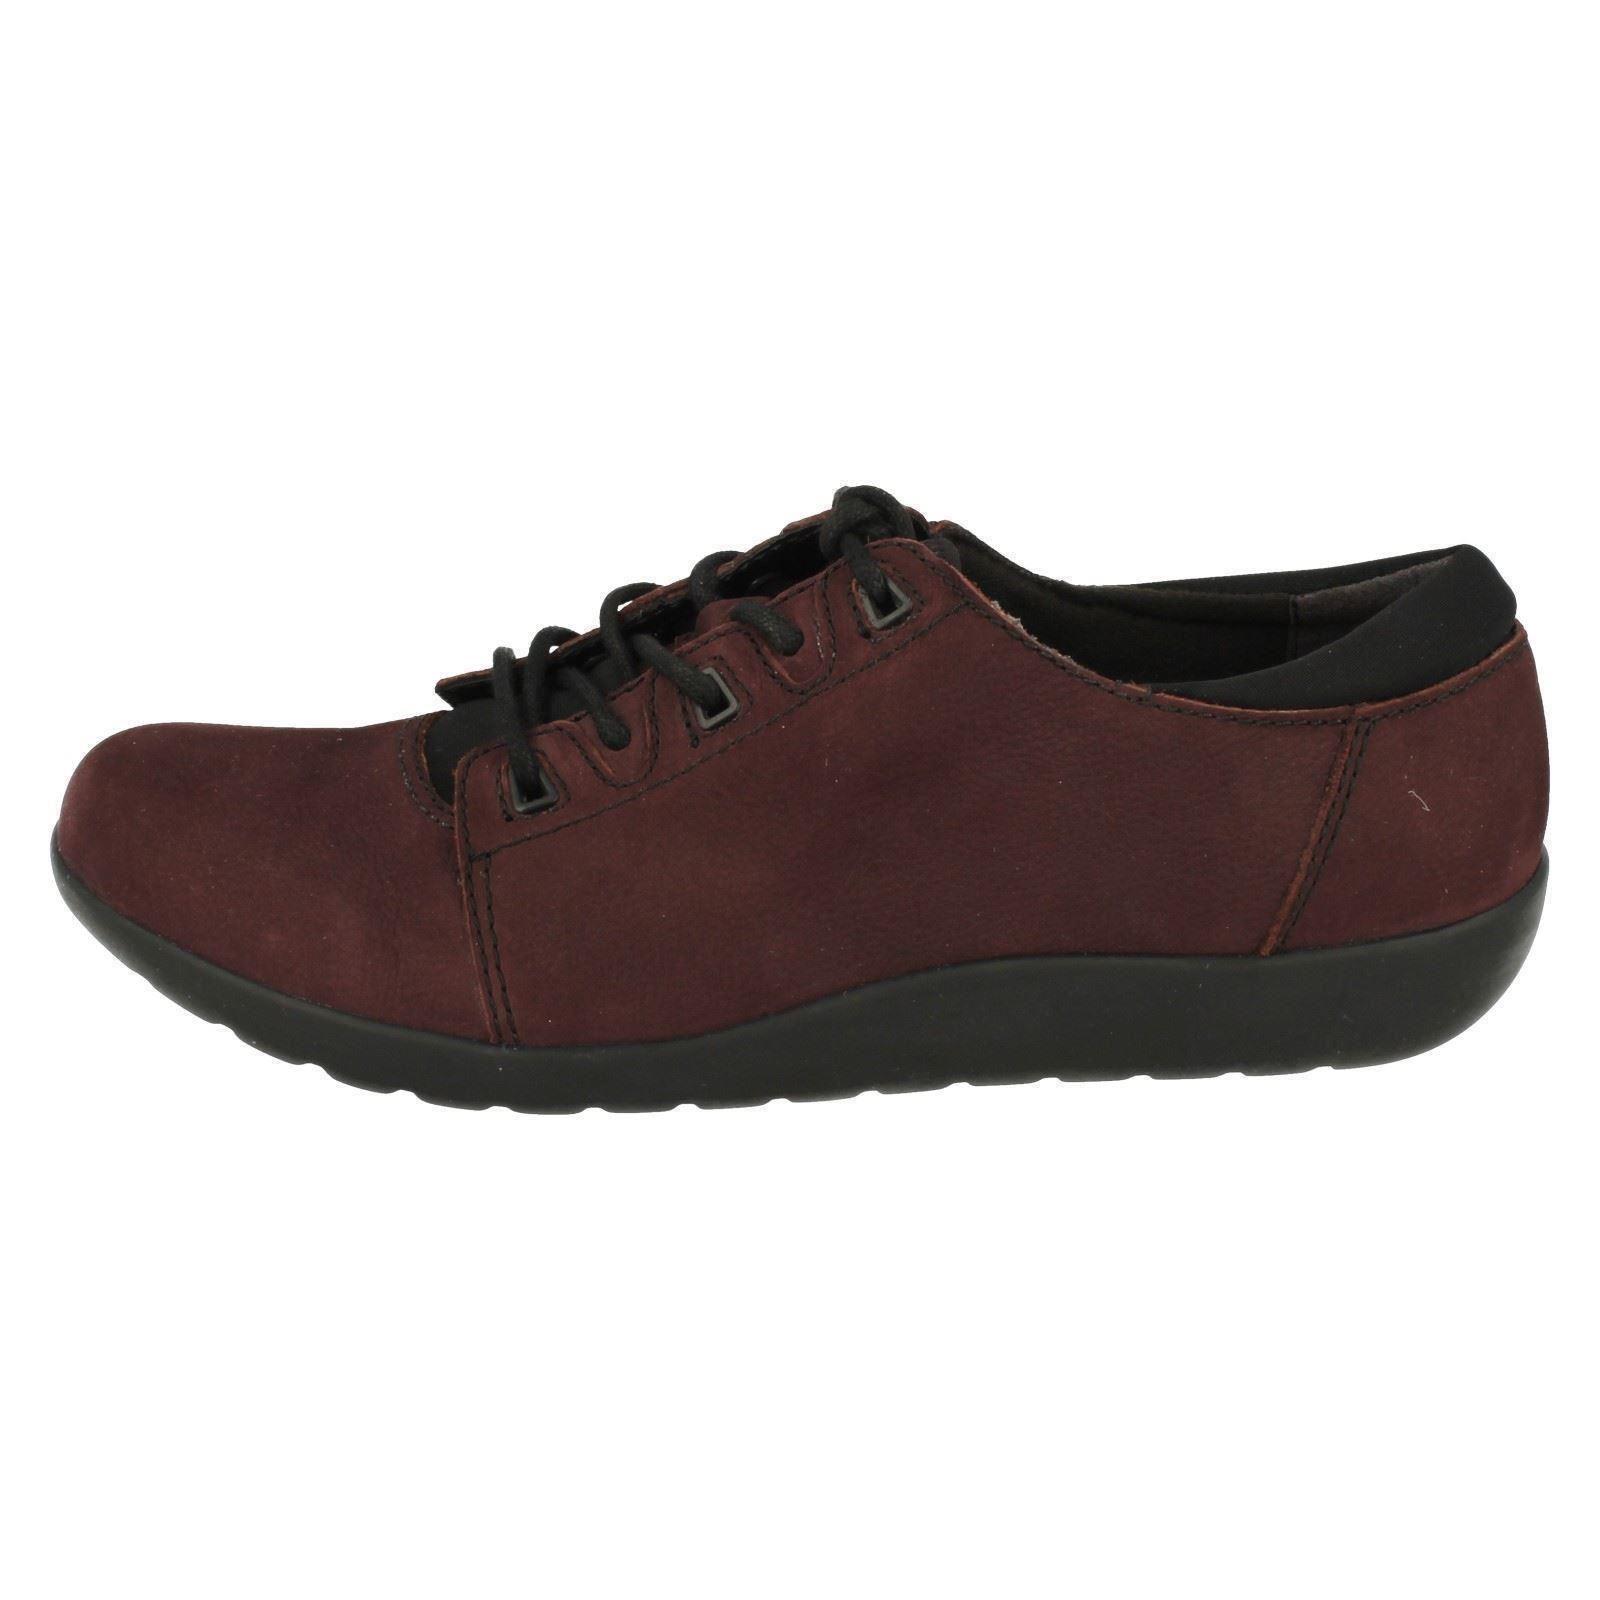 Ladies Clarks Lace Up Flat Shoes /'Medora Bella/'